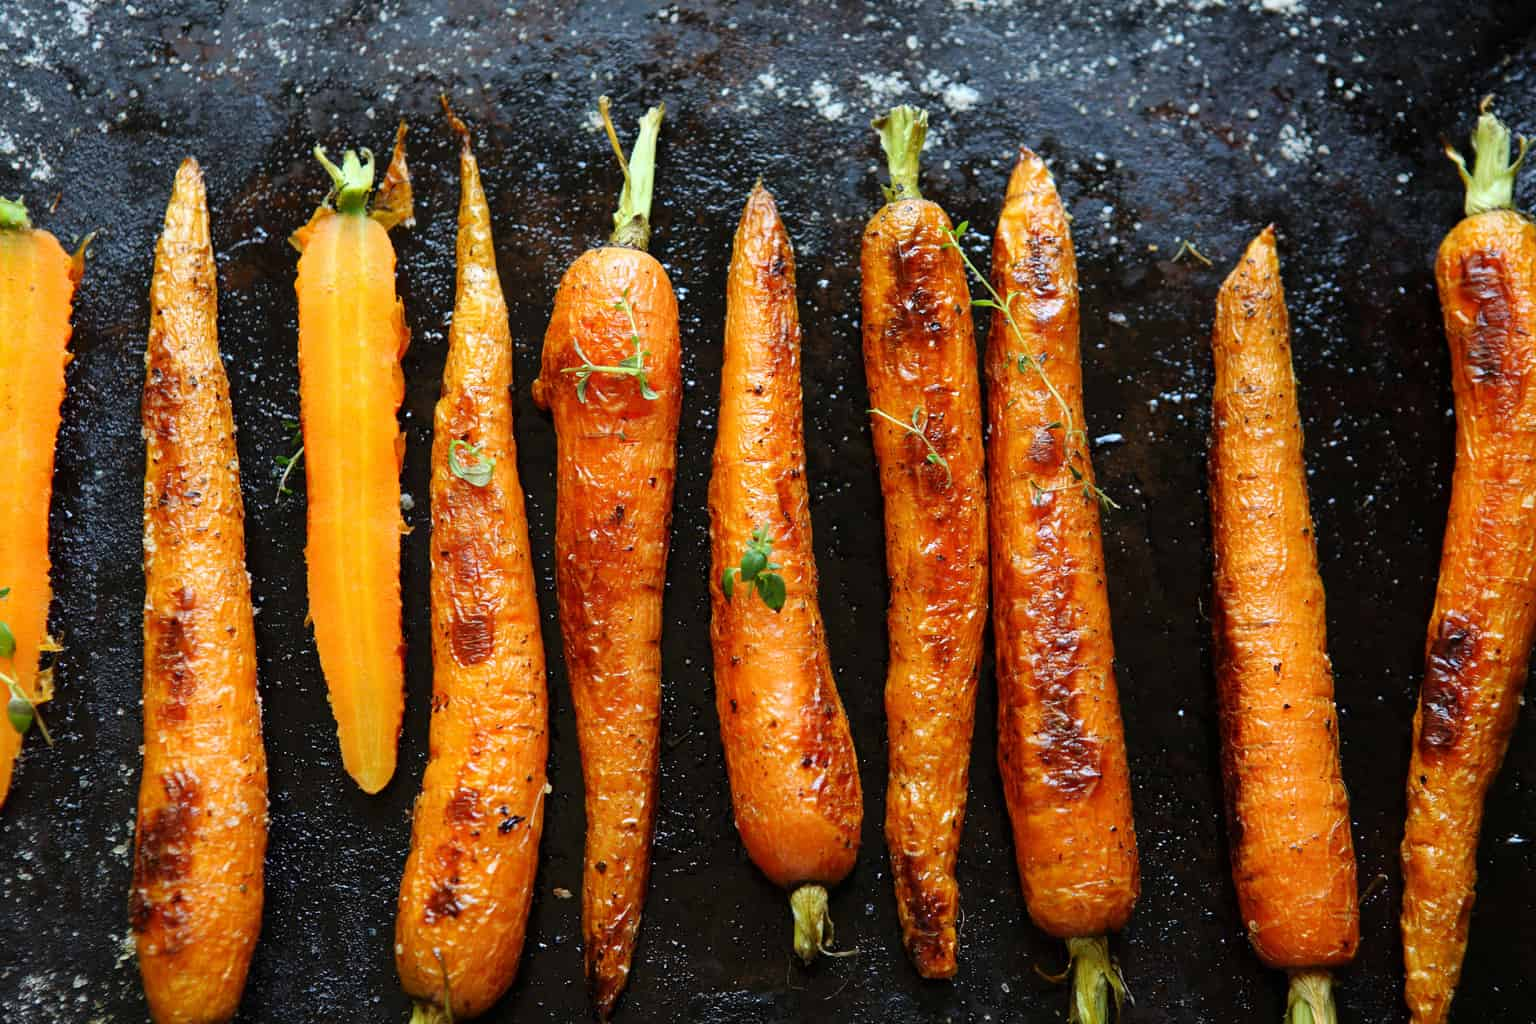 Roasted carrots on a baking sheet